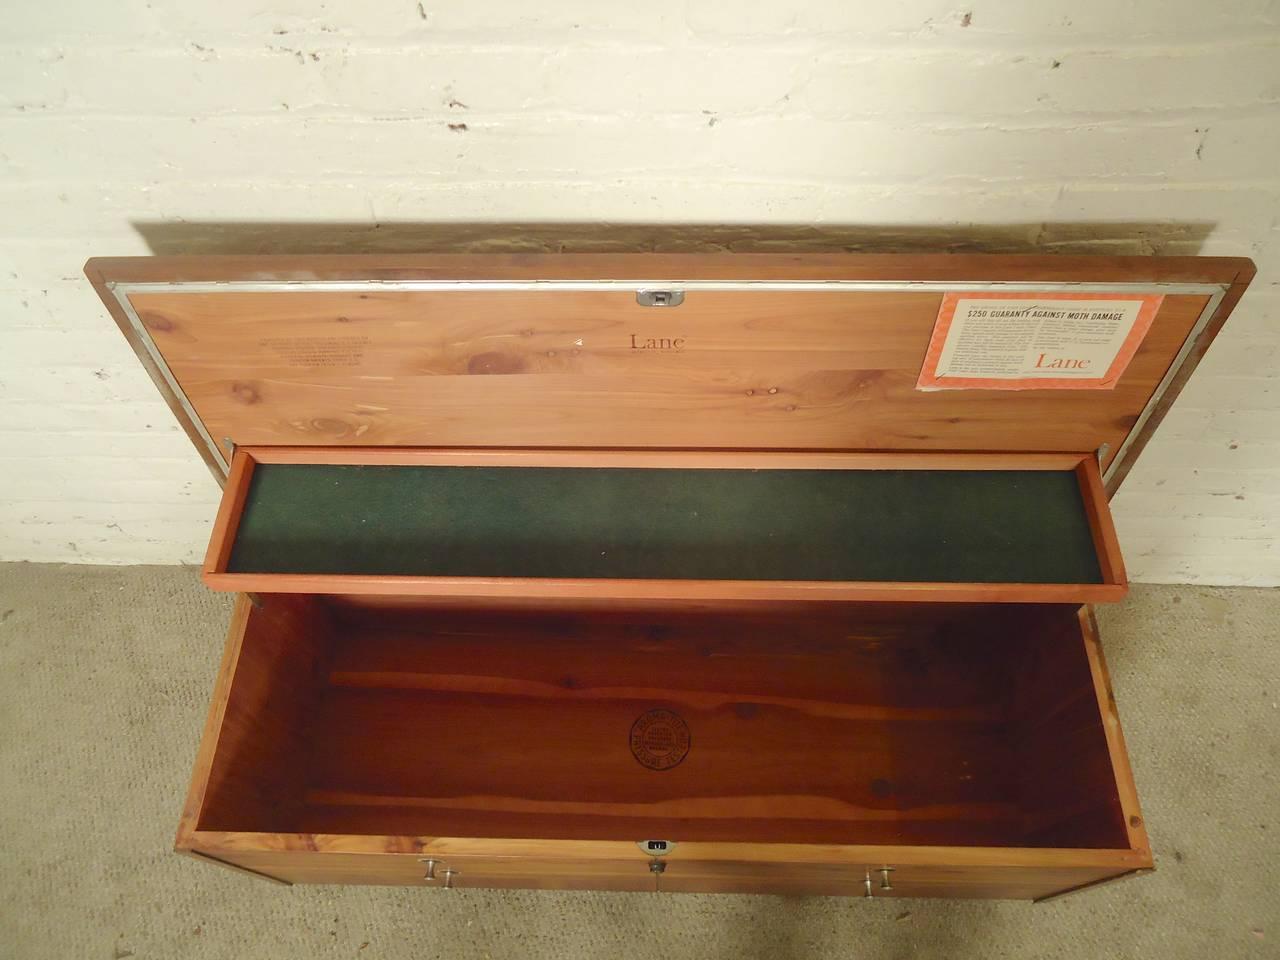 sleek mid century cedar chest by lane for sale at 1stdibs. Black Bedroom Furniture Sets. Home Design Ideas